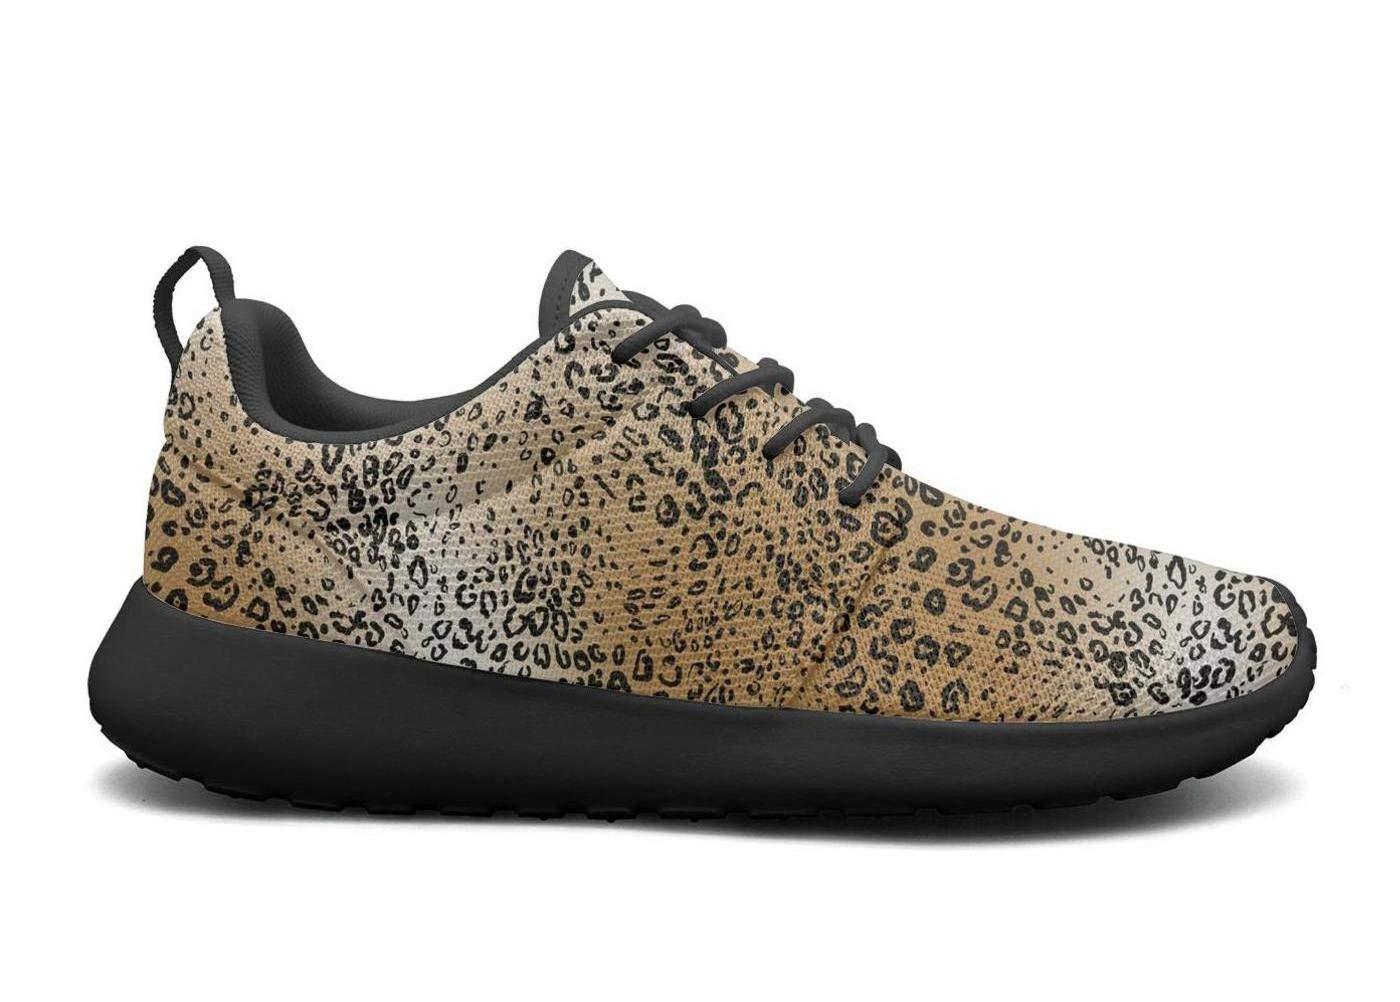 cb989b4a00c5 Amazon.com  Lingxxshow Cheetah Leopard Animal Skin Texture Image Print  Women Sports Running Shoes Casual Lightweight Athletic Sneakers Fashion   Sports   ...